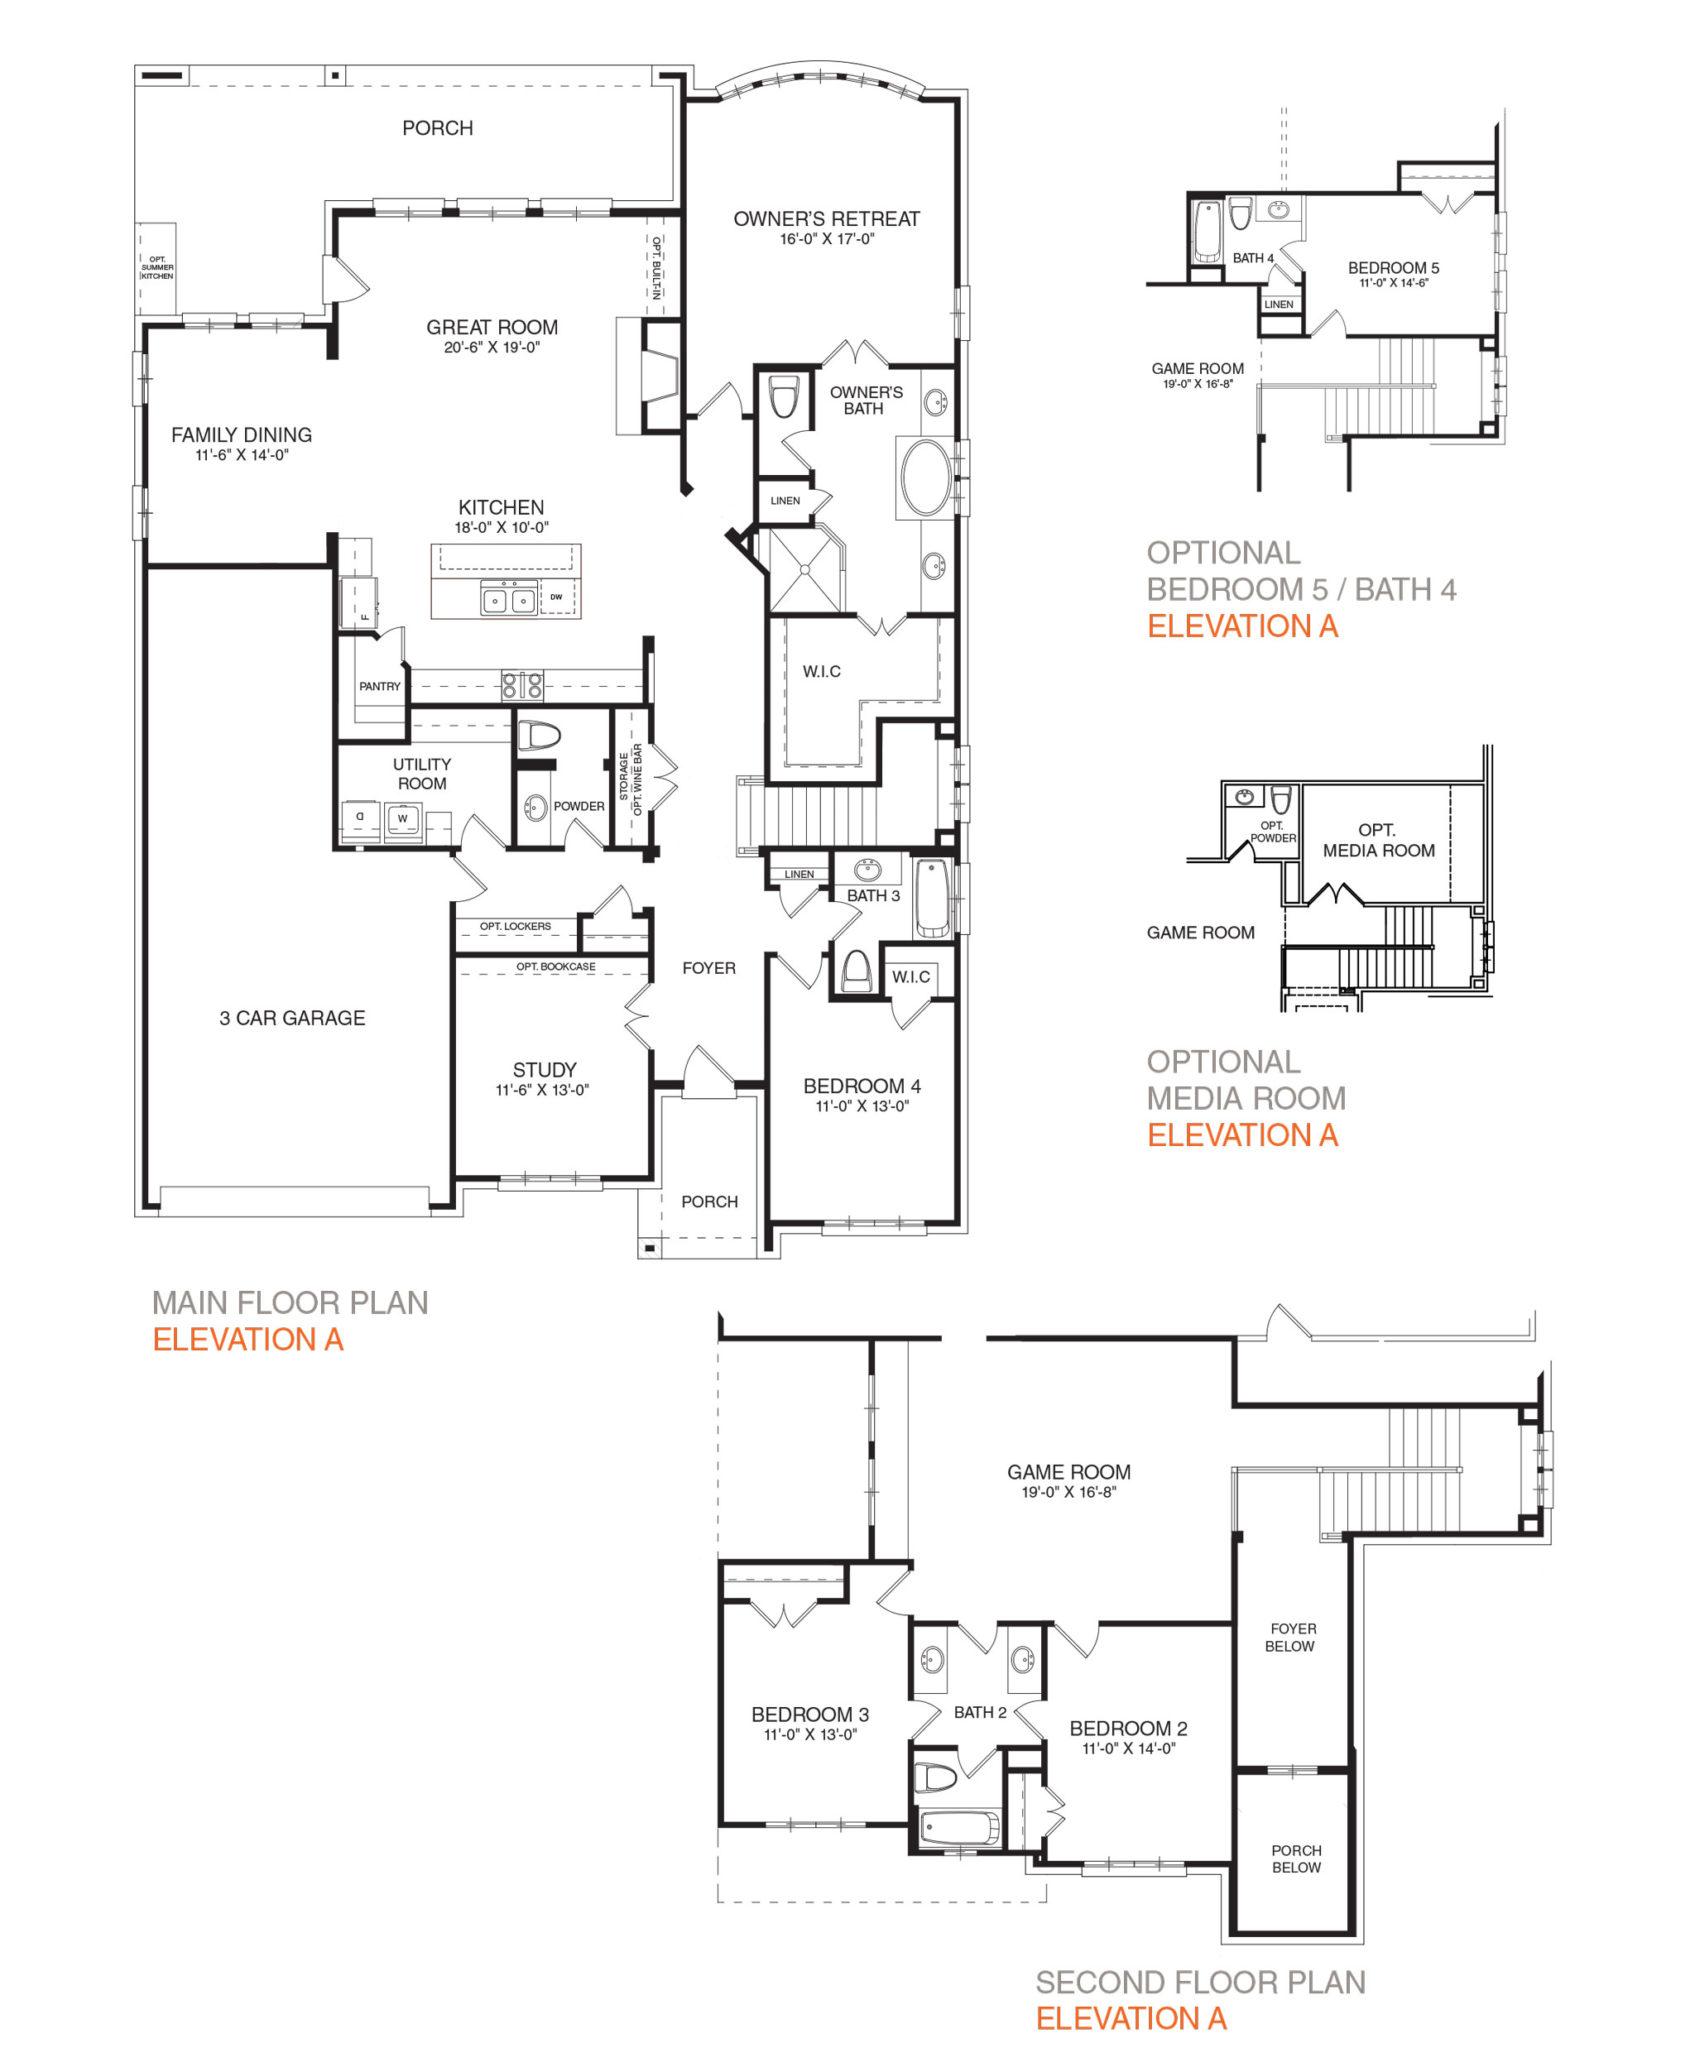 35846-60-10-pinto-web-jan2021-floor-plan